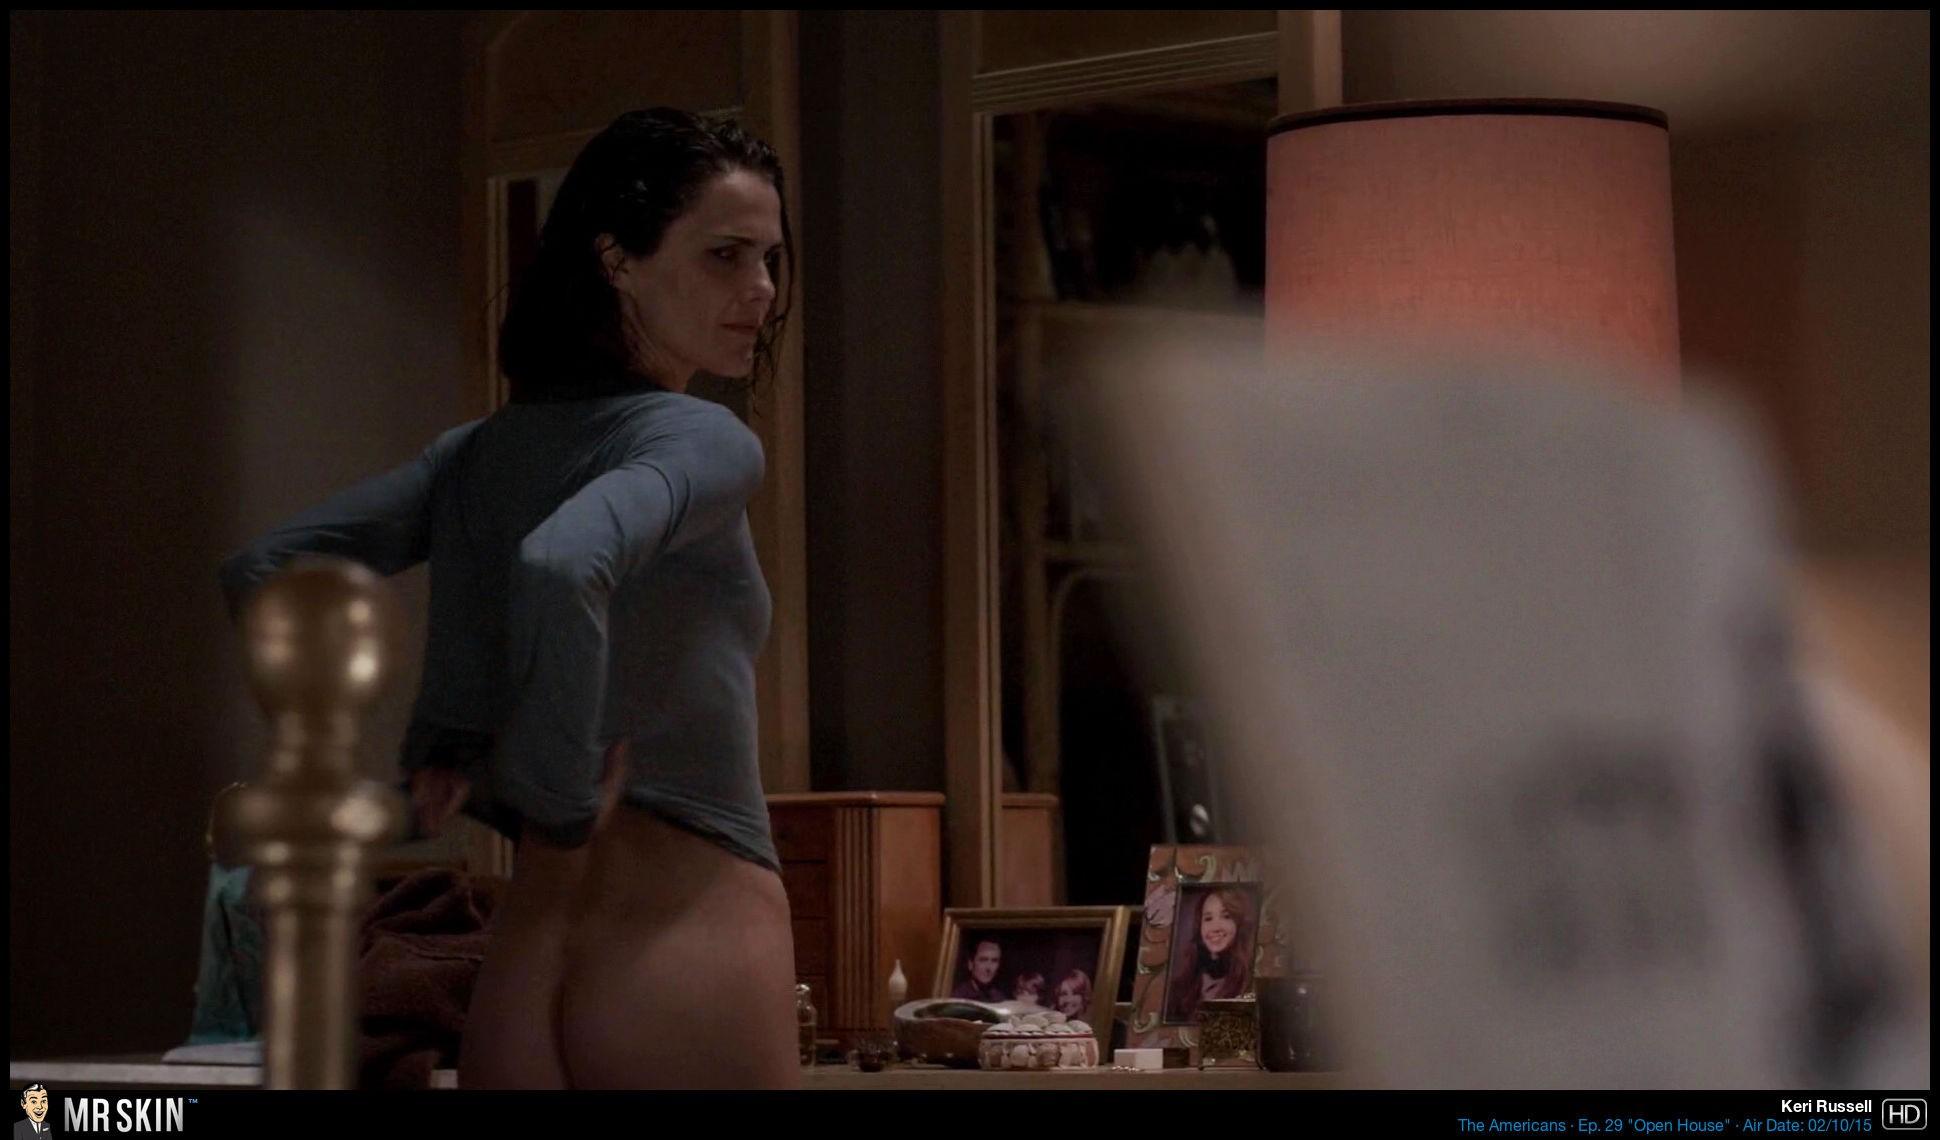 Escena de sexo de Keri russell